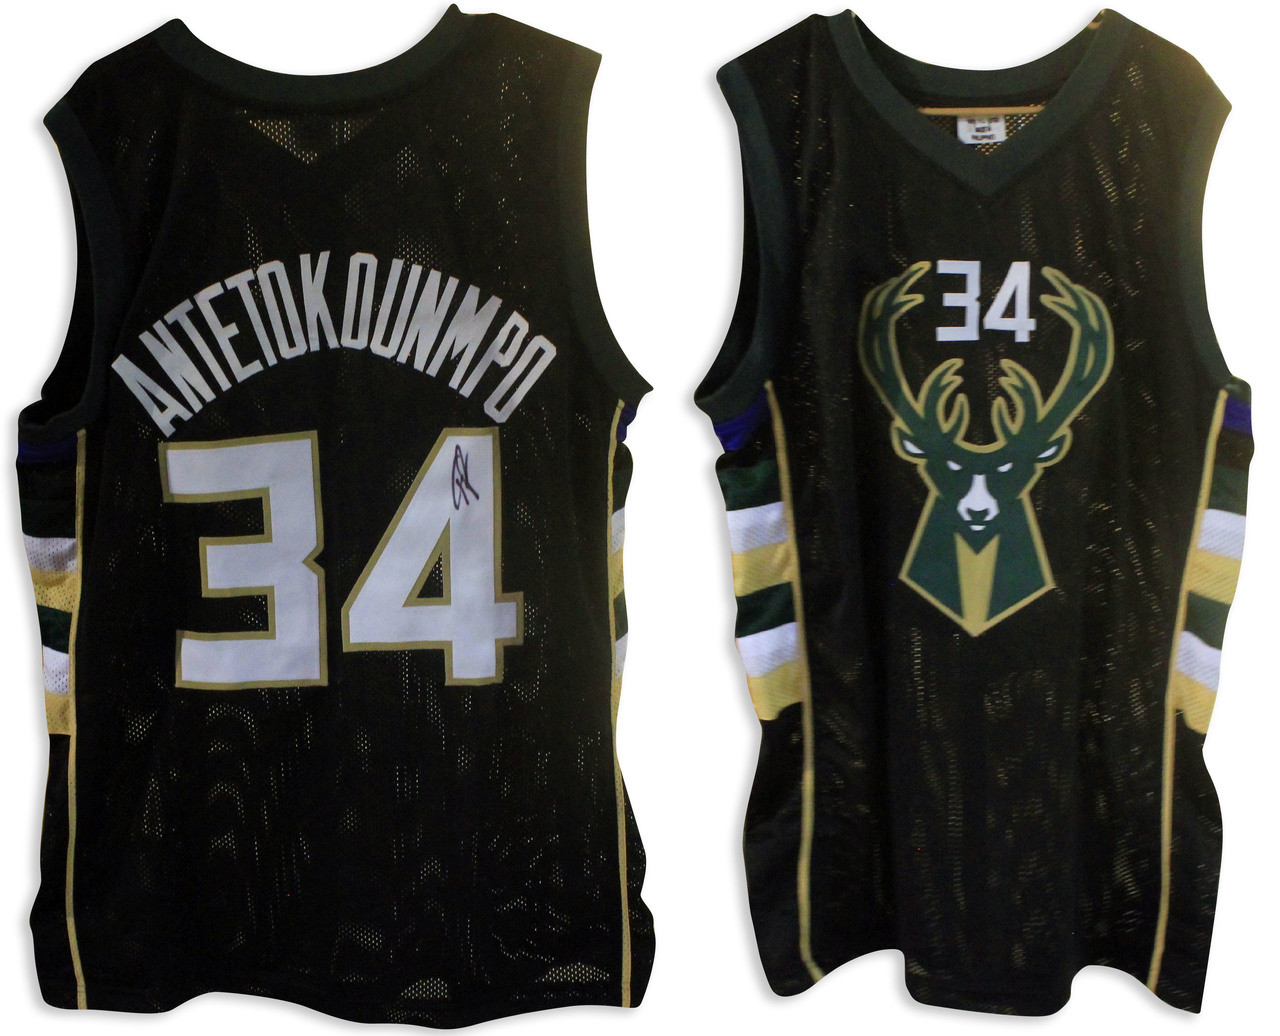 buy online 5cd84 cde8d Giannis Antetokounmpo Signed Milwaukee Black Jersey